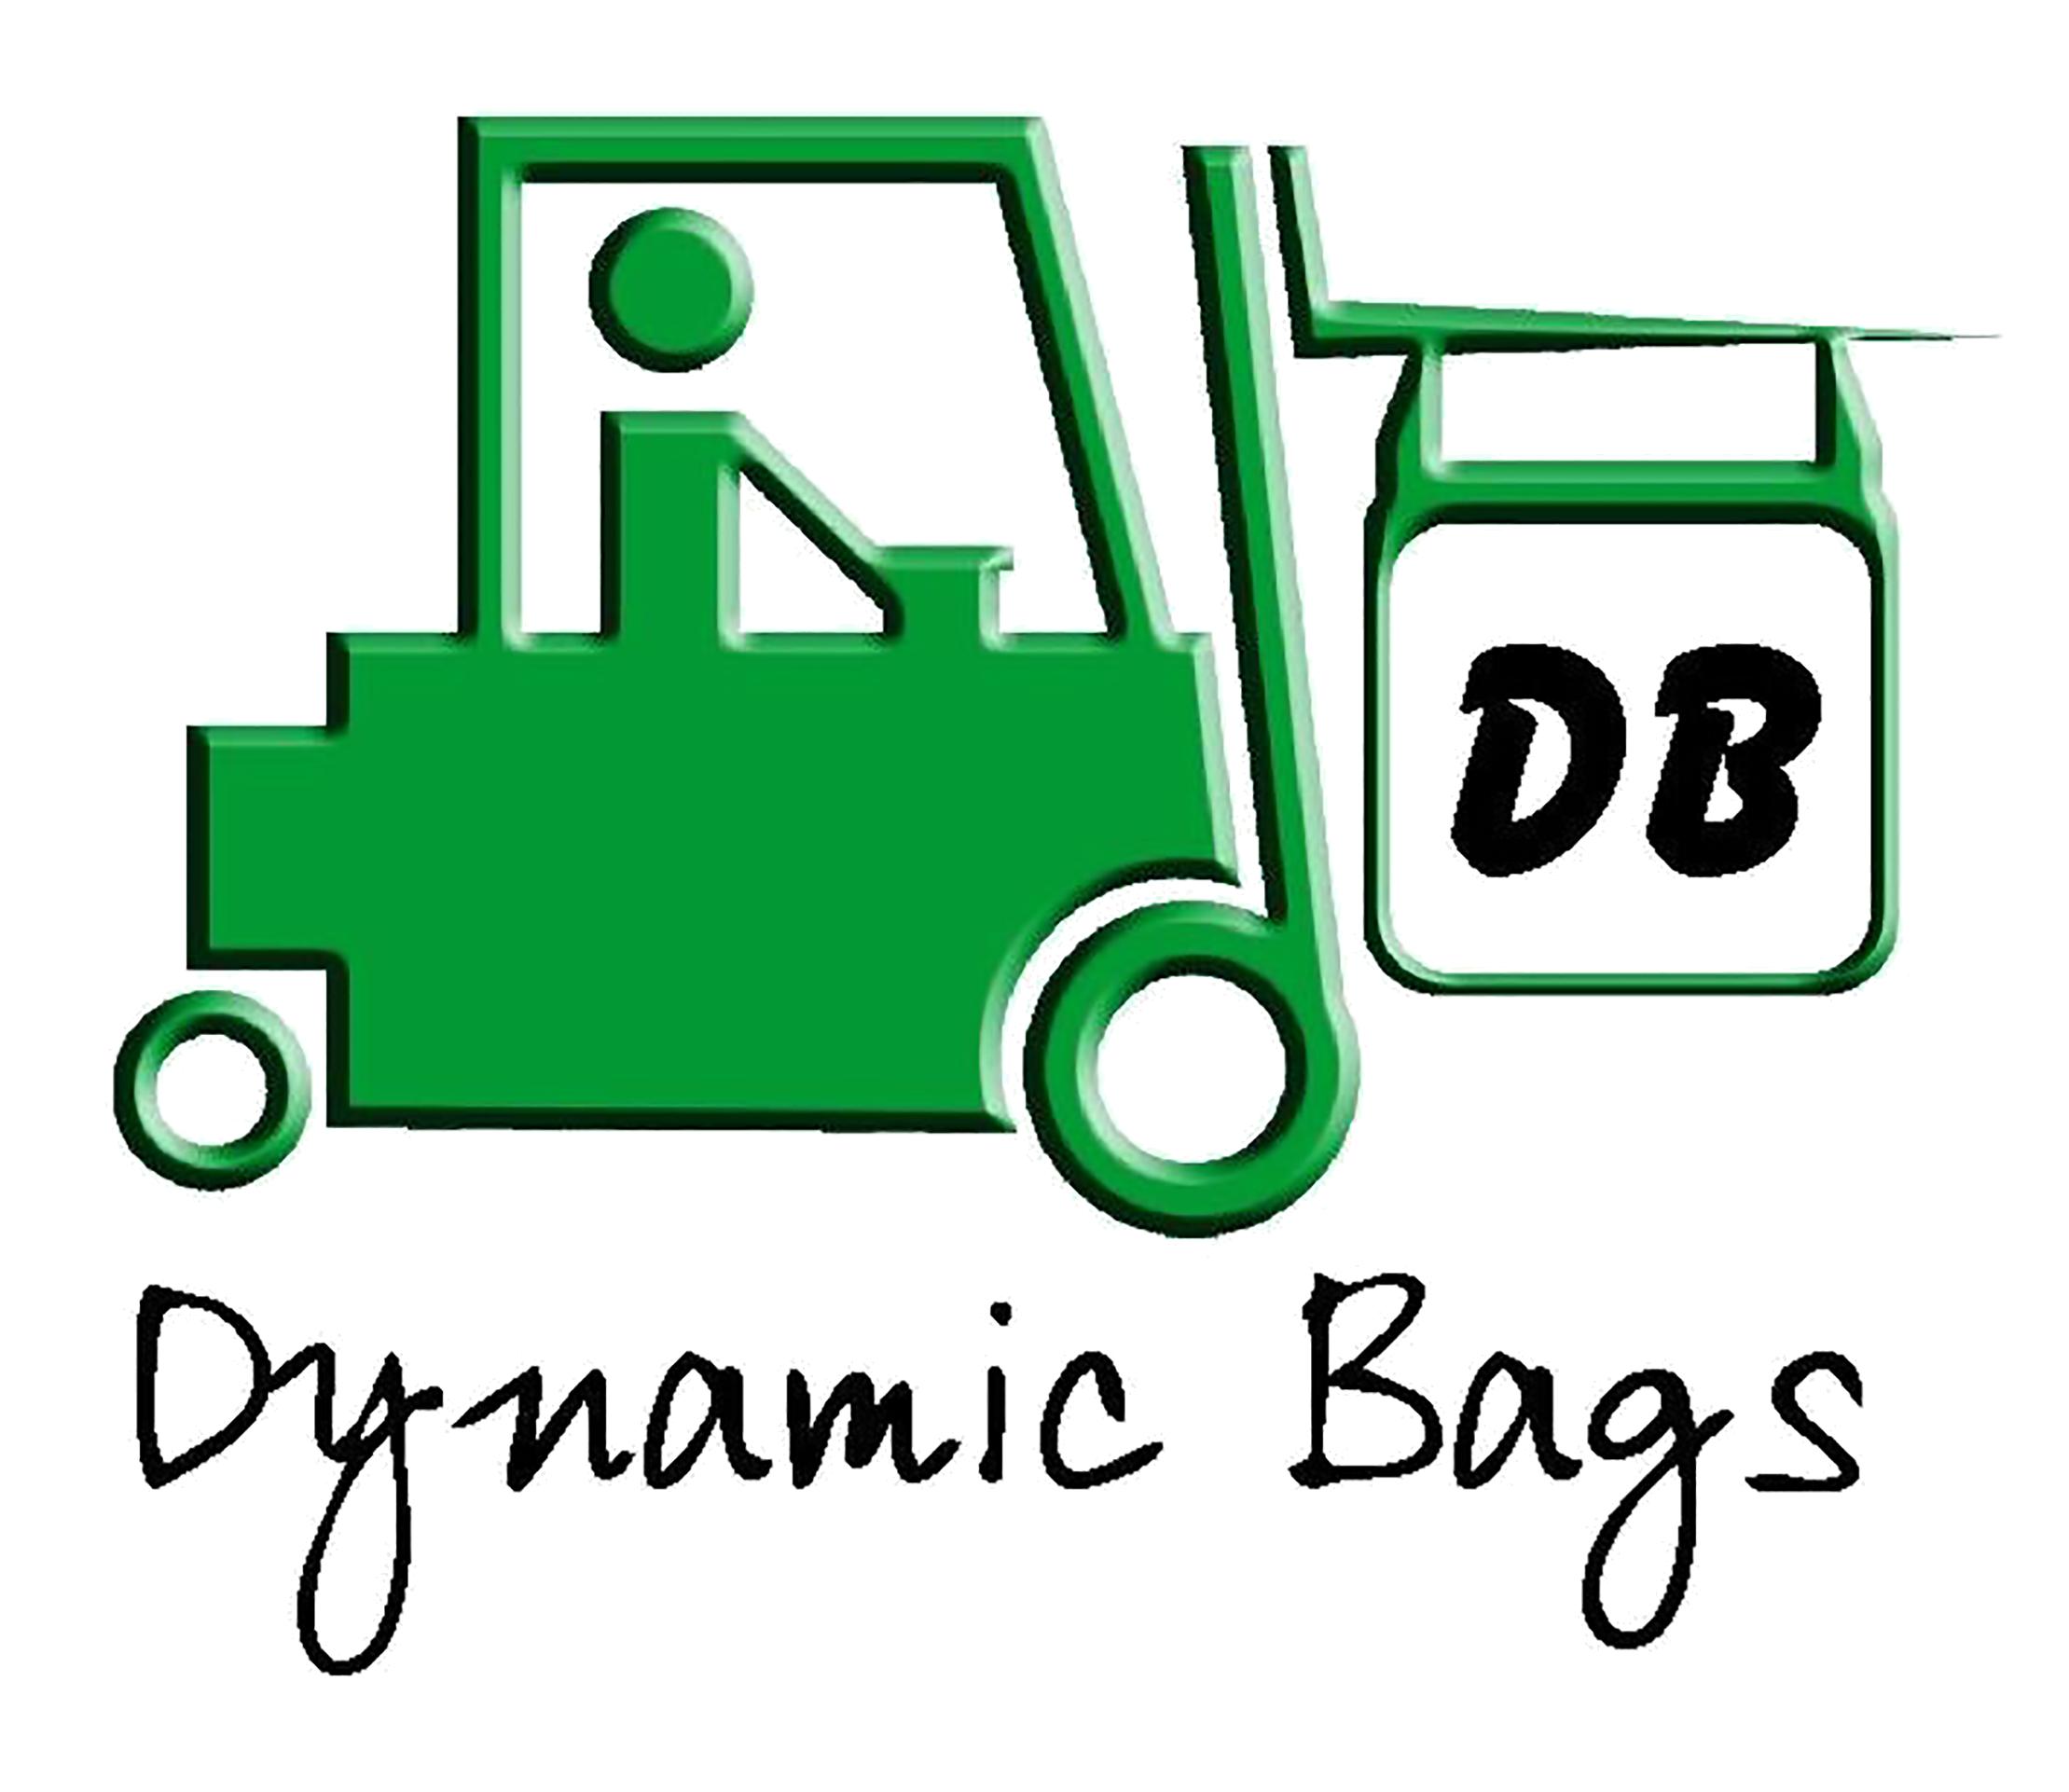 Dynamic Bags